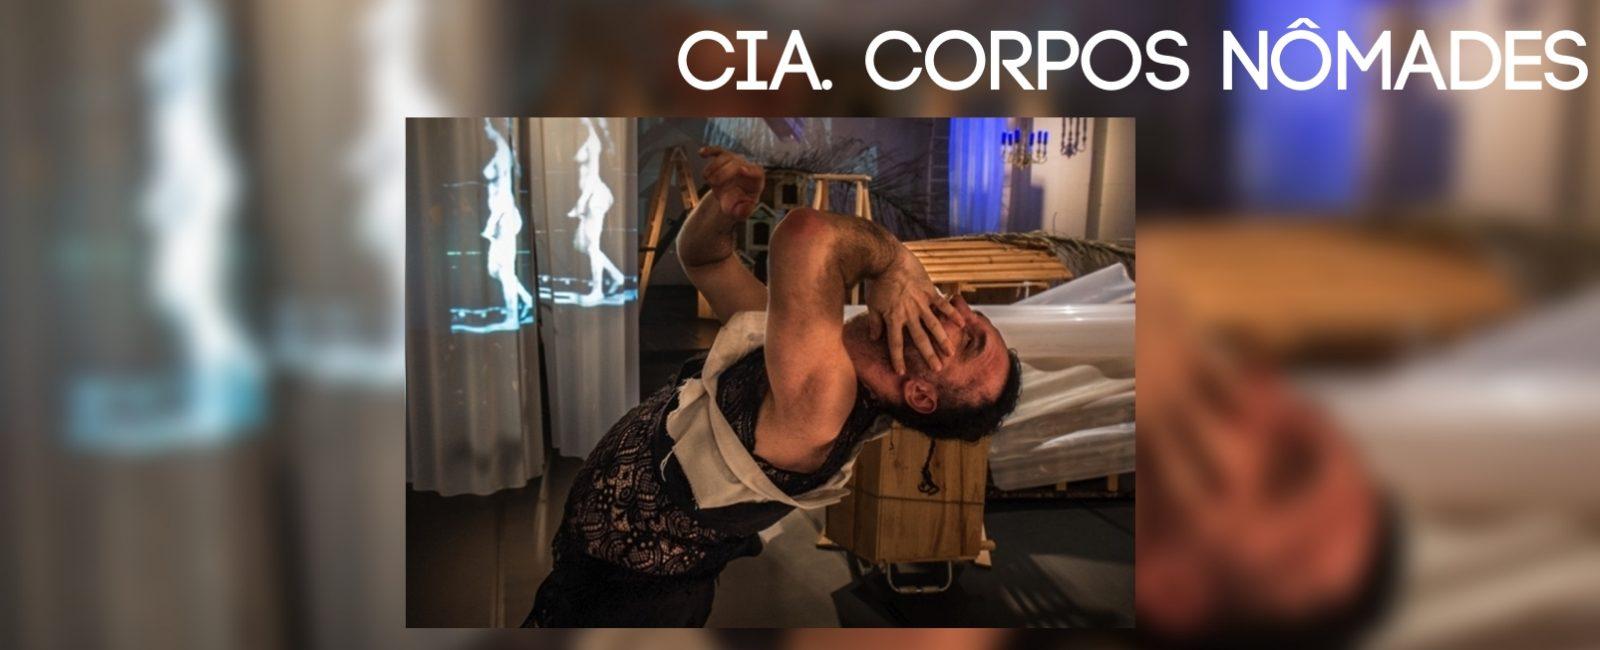 CIA CORPOS NÔMADES